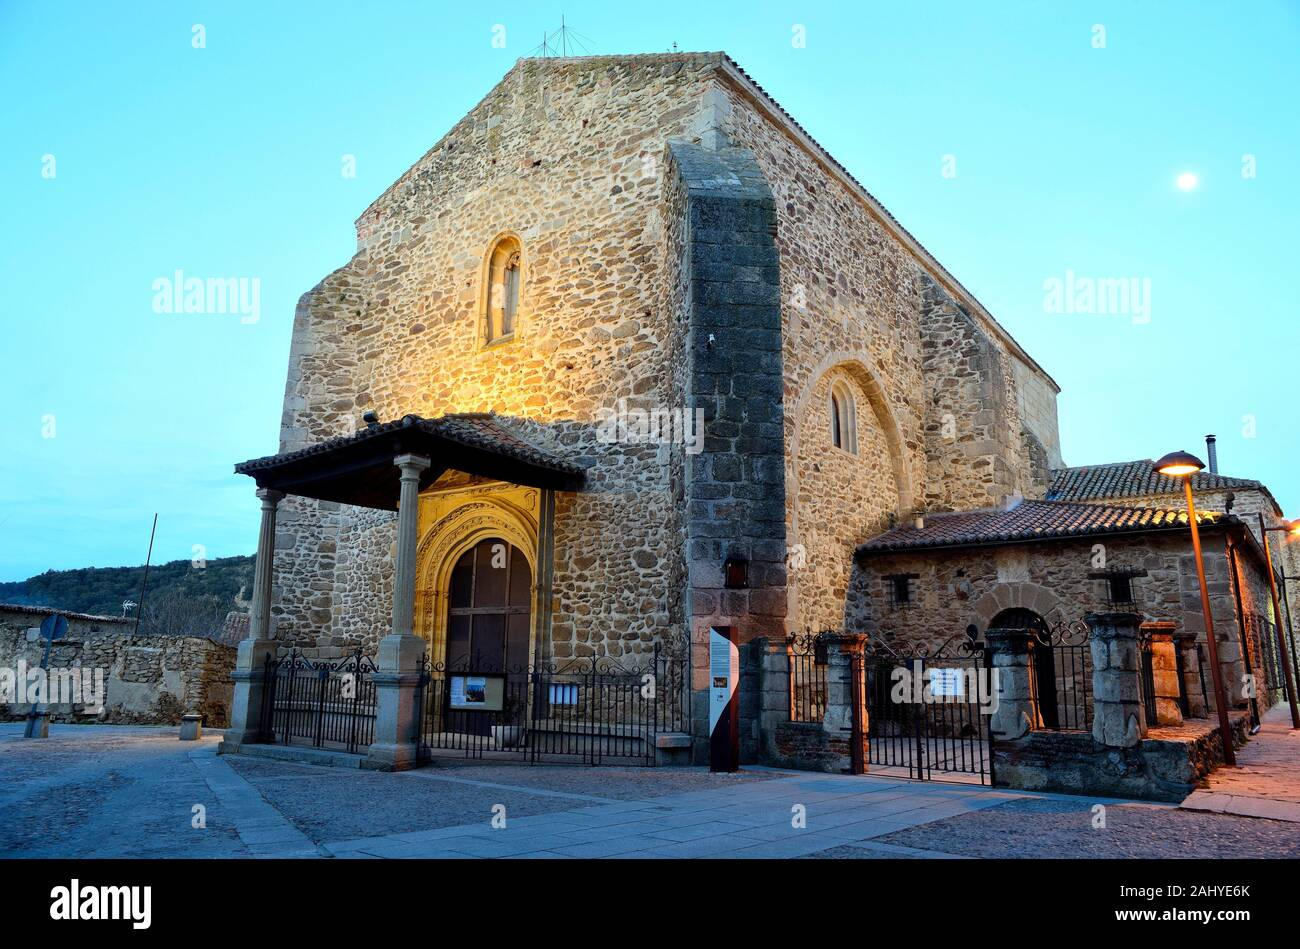 Church of Santa Maria del Castillo in the old town of Buitrago del Lozoya, Madrid, Spain. Stock Photo